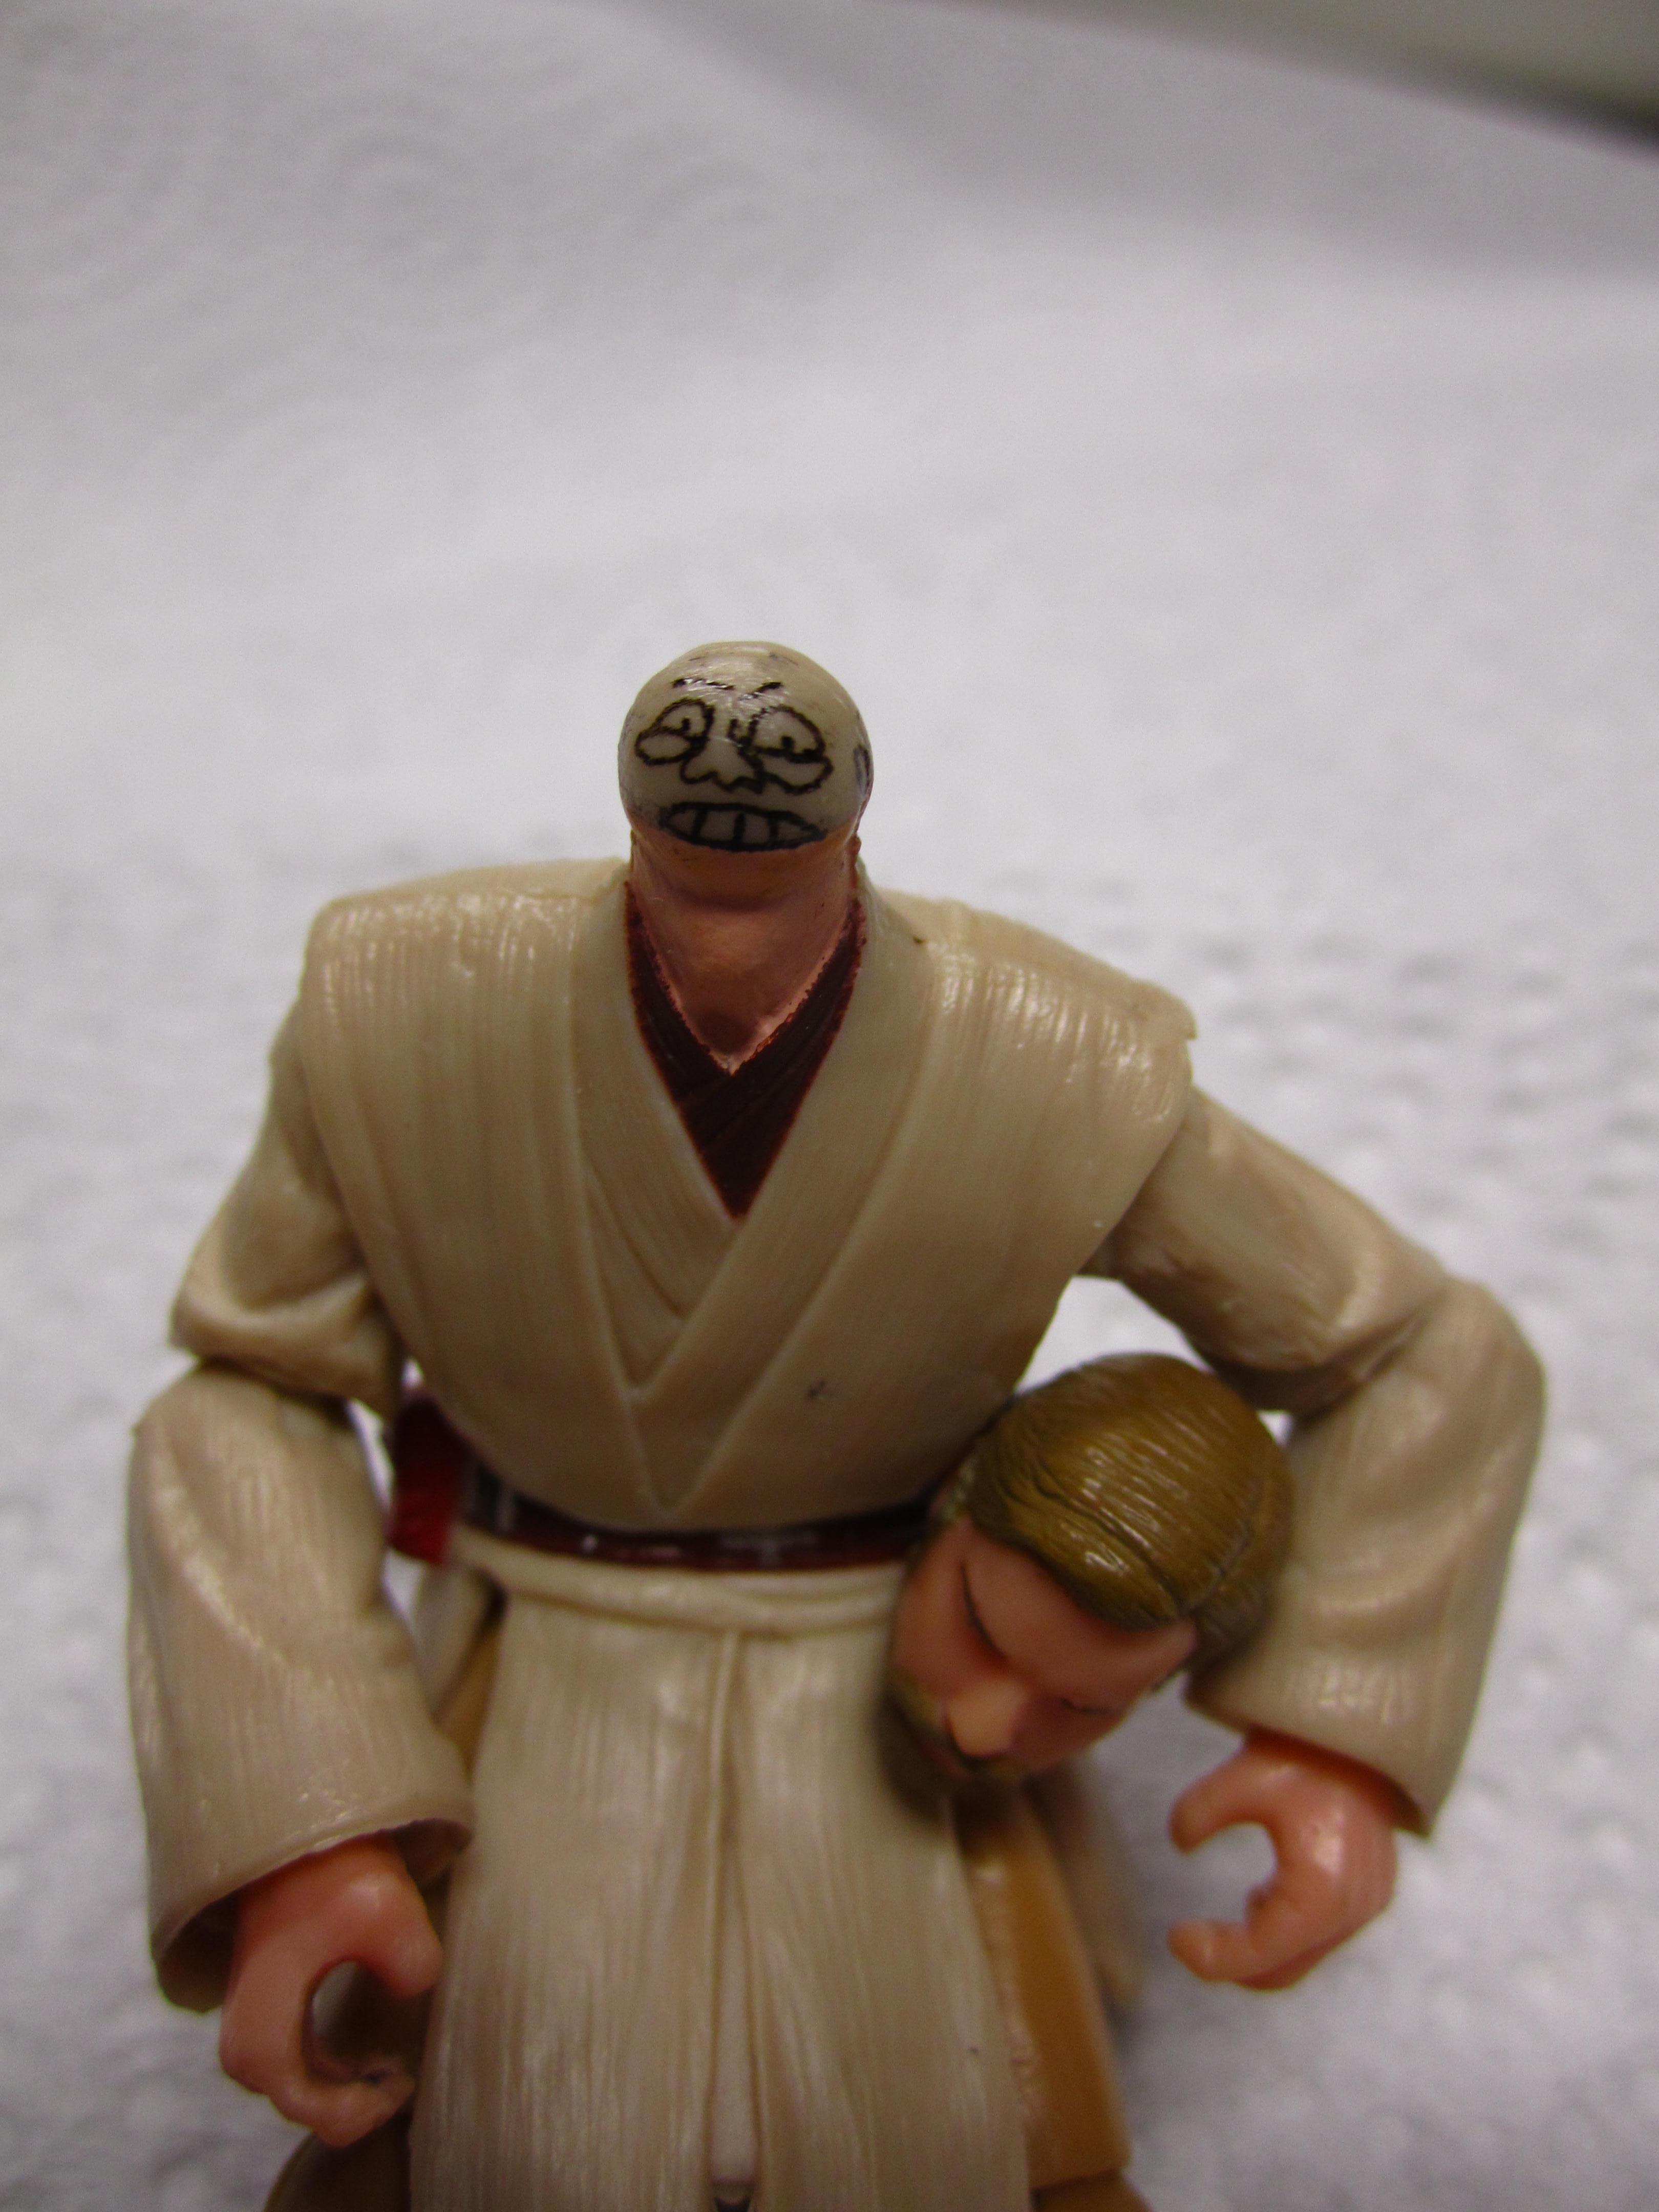 Turn the Jedi Obi-Wan Kenobi into a Nubby Pinhead. Easy!